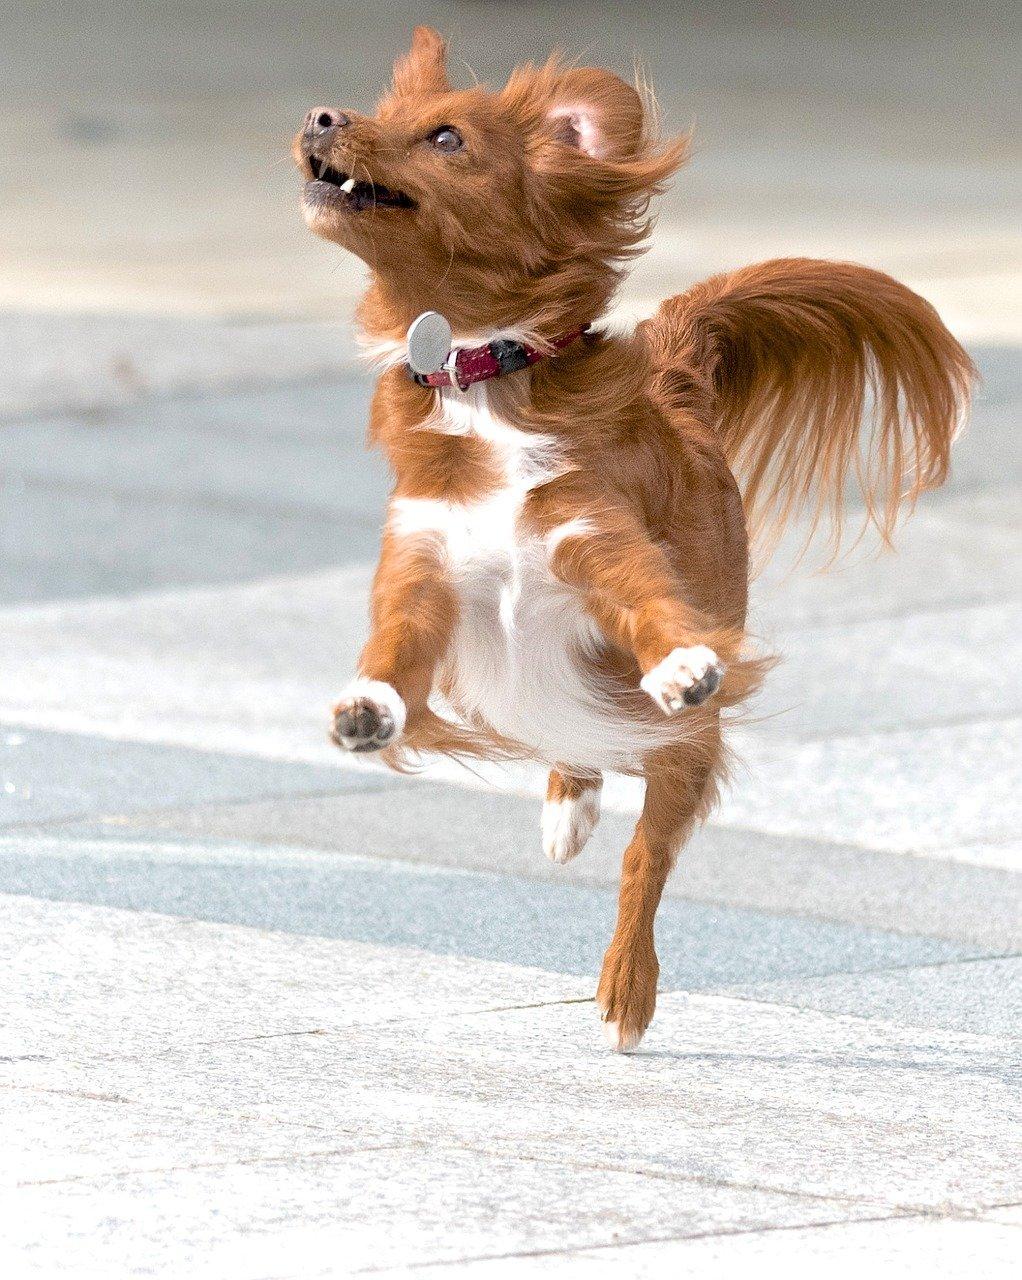 Dog having fun jumping with glee.